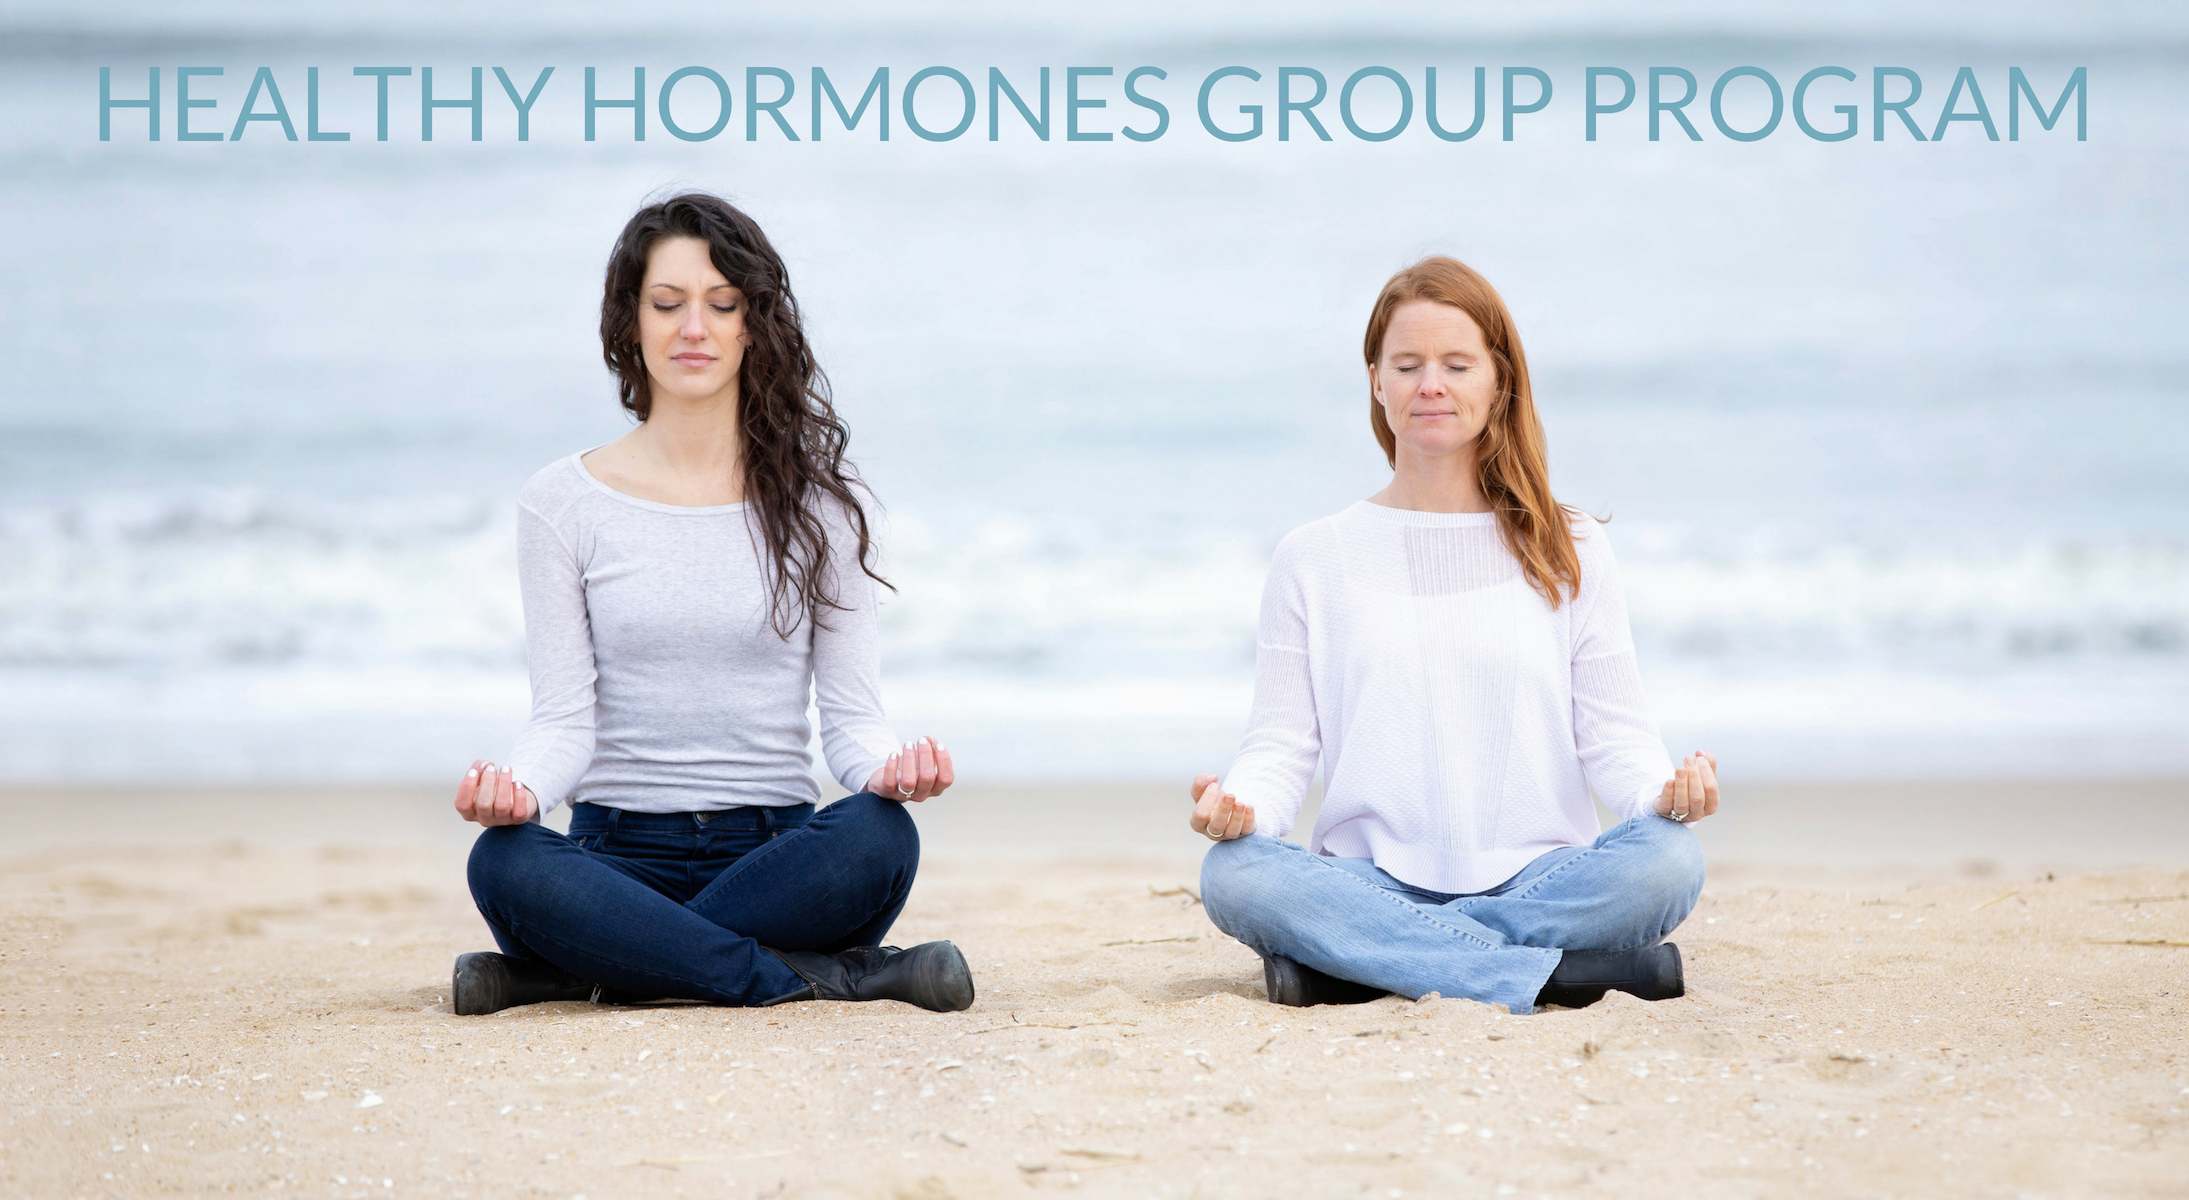 Healthy Hormones Group Program with Megan Rand and Alex Golden